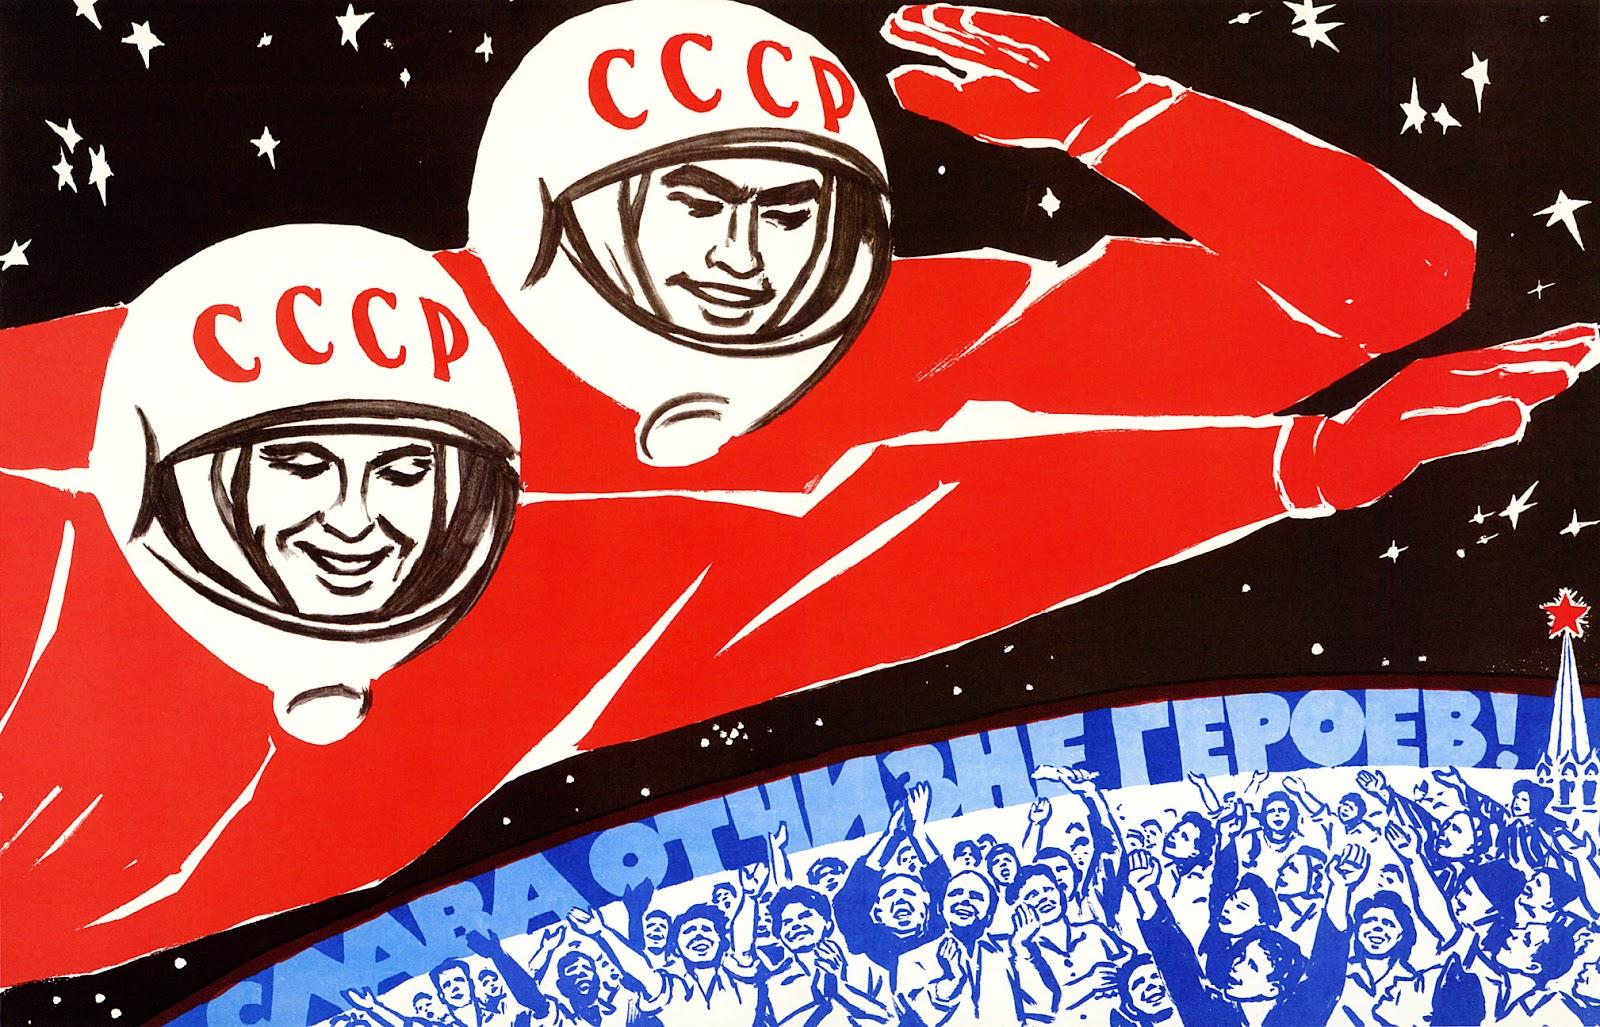 soviet space program name - photo #8